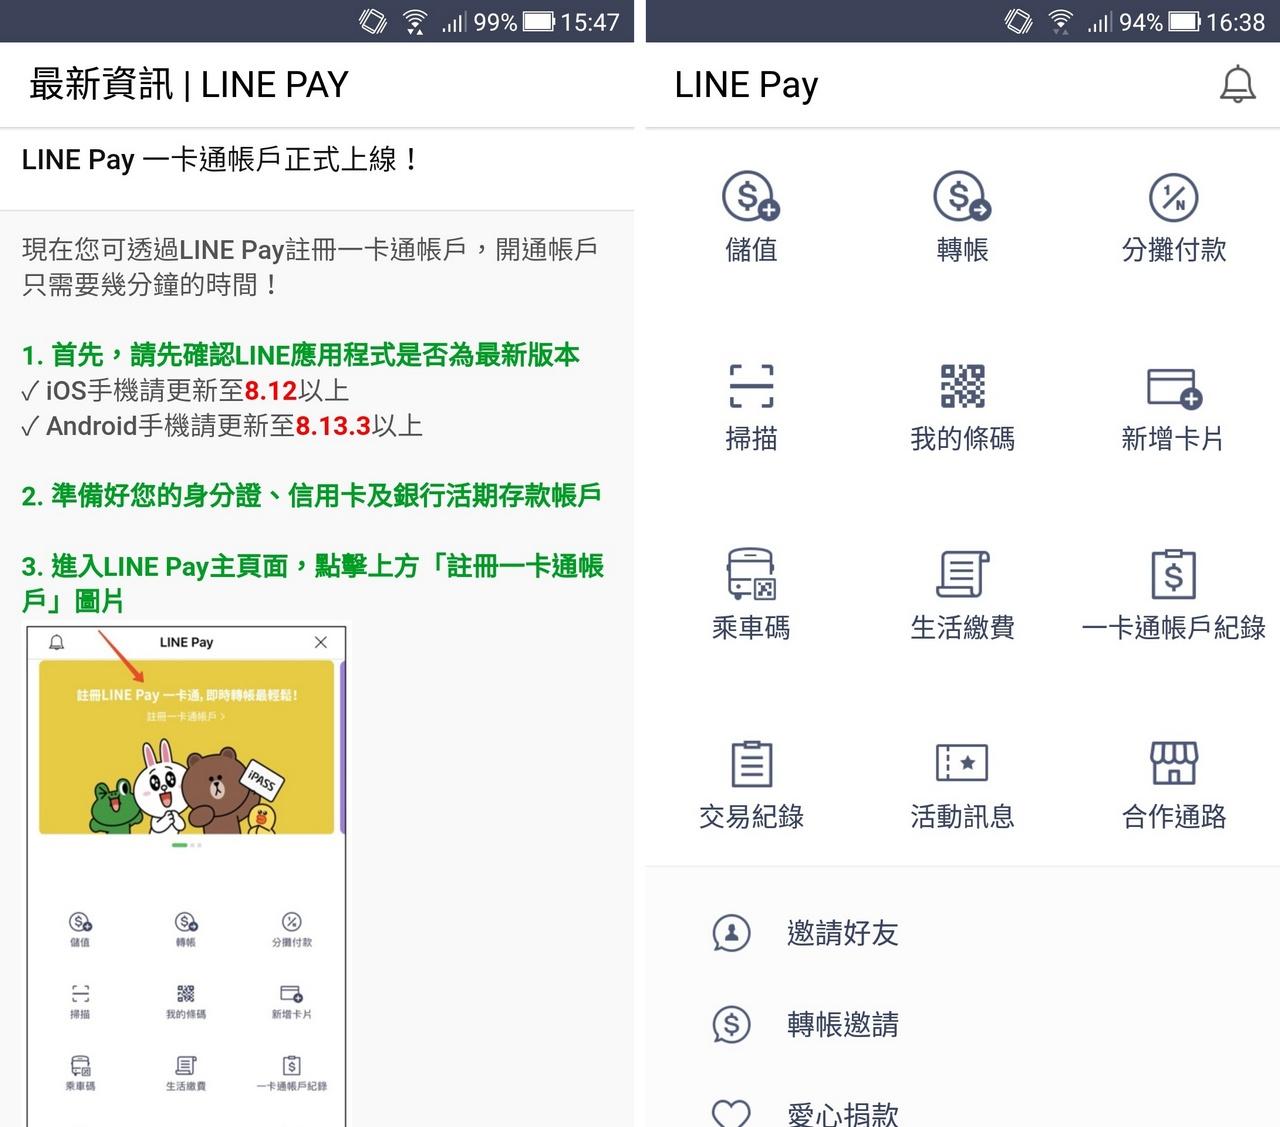 LINE PAY一卡通帳號正式啟動 轉帳/付款/乘車/繳費 一鍵搞定